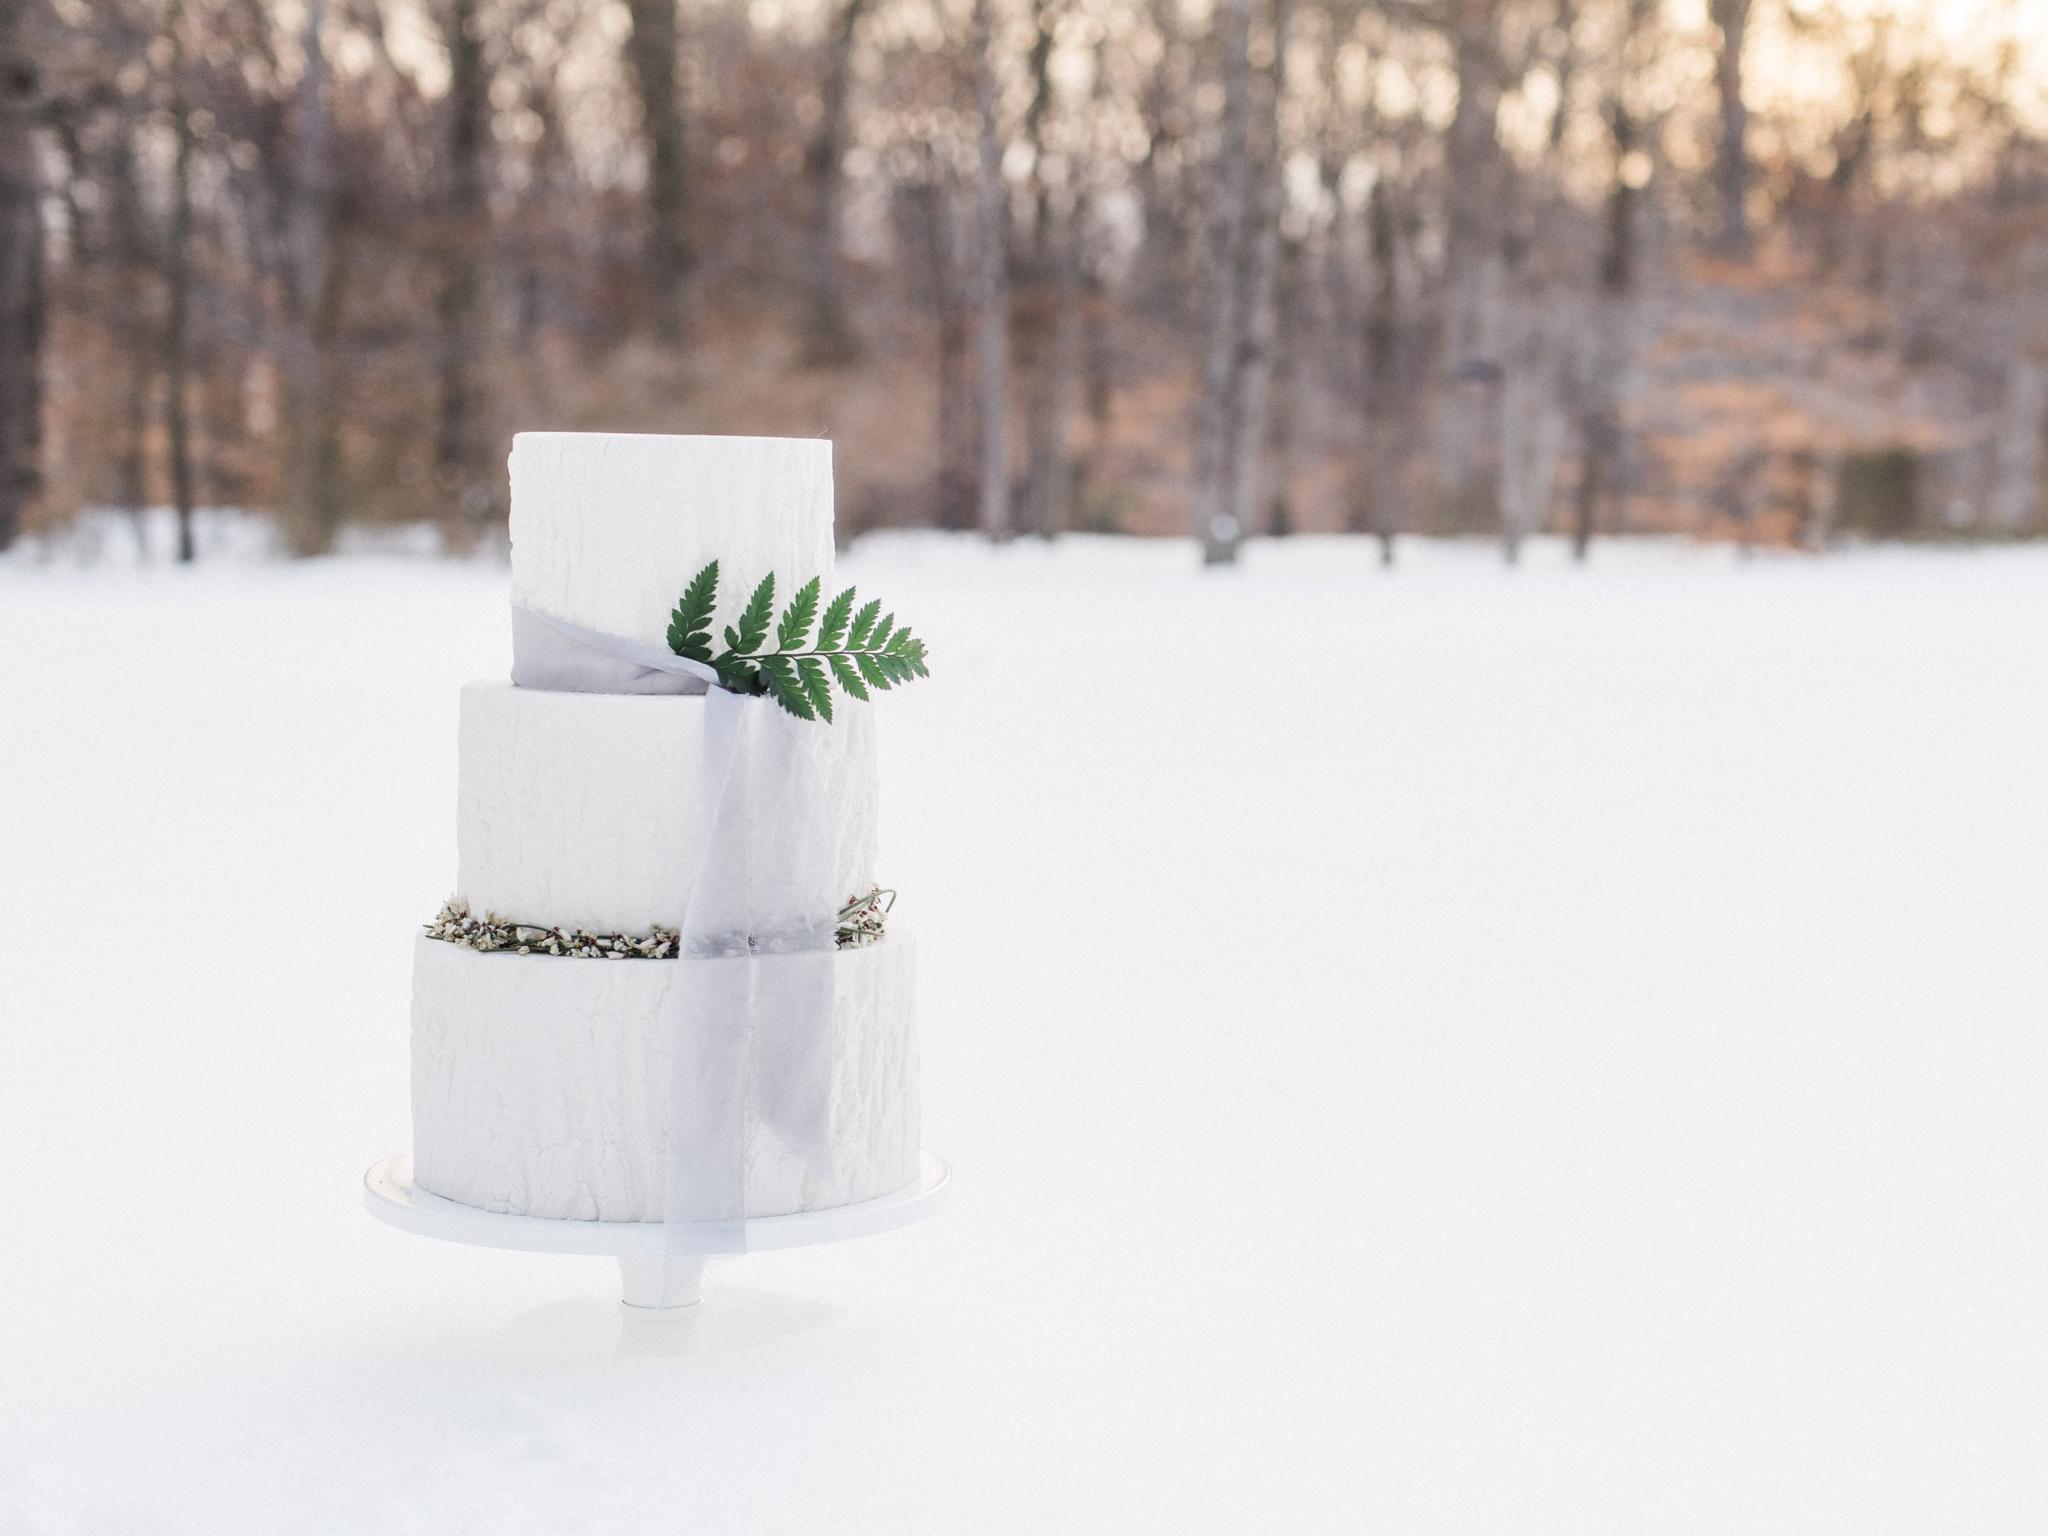 blizzard snow winter wedding editorial by washington dc fine art wedding photographer Lissa Ryan Photography